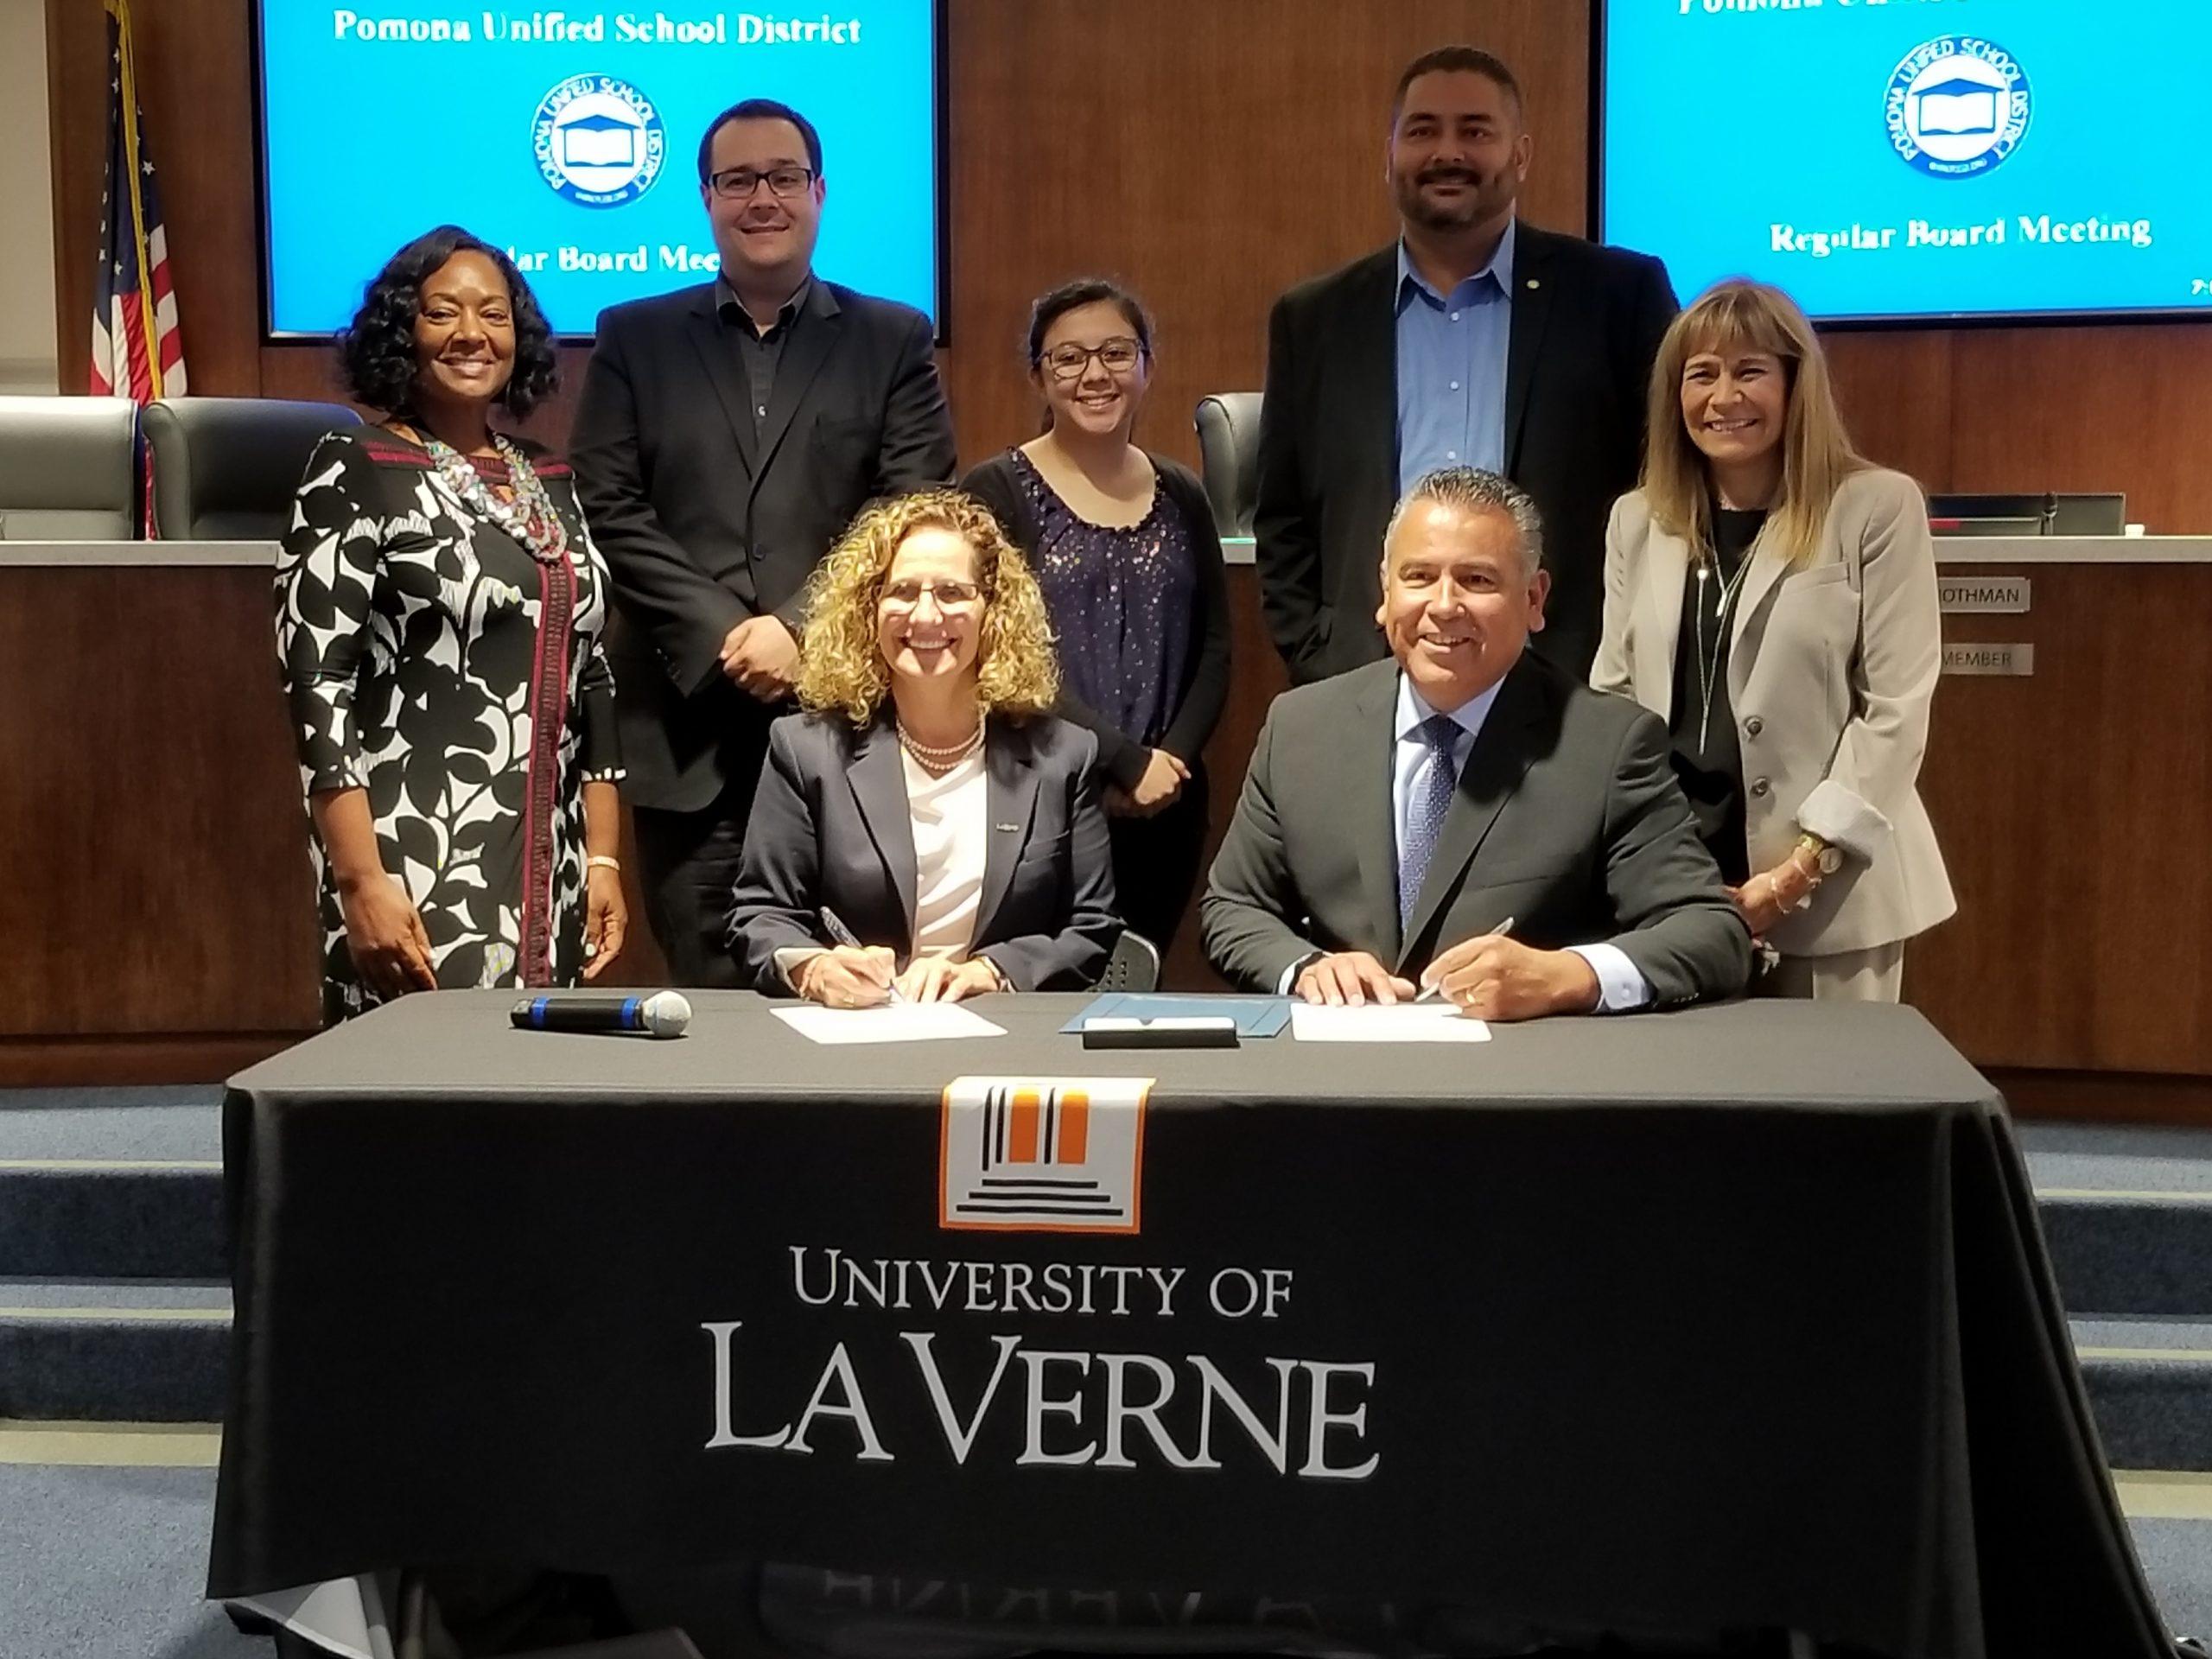 University Of La Verne, Pomona Unified To Partner On For Pomona Unified School District Calendar